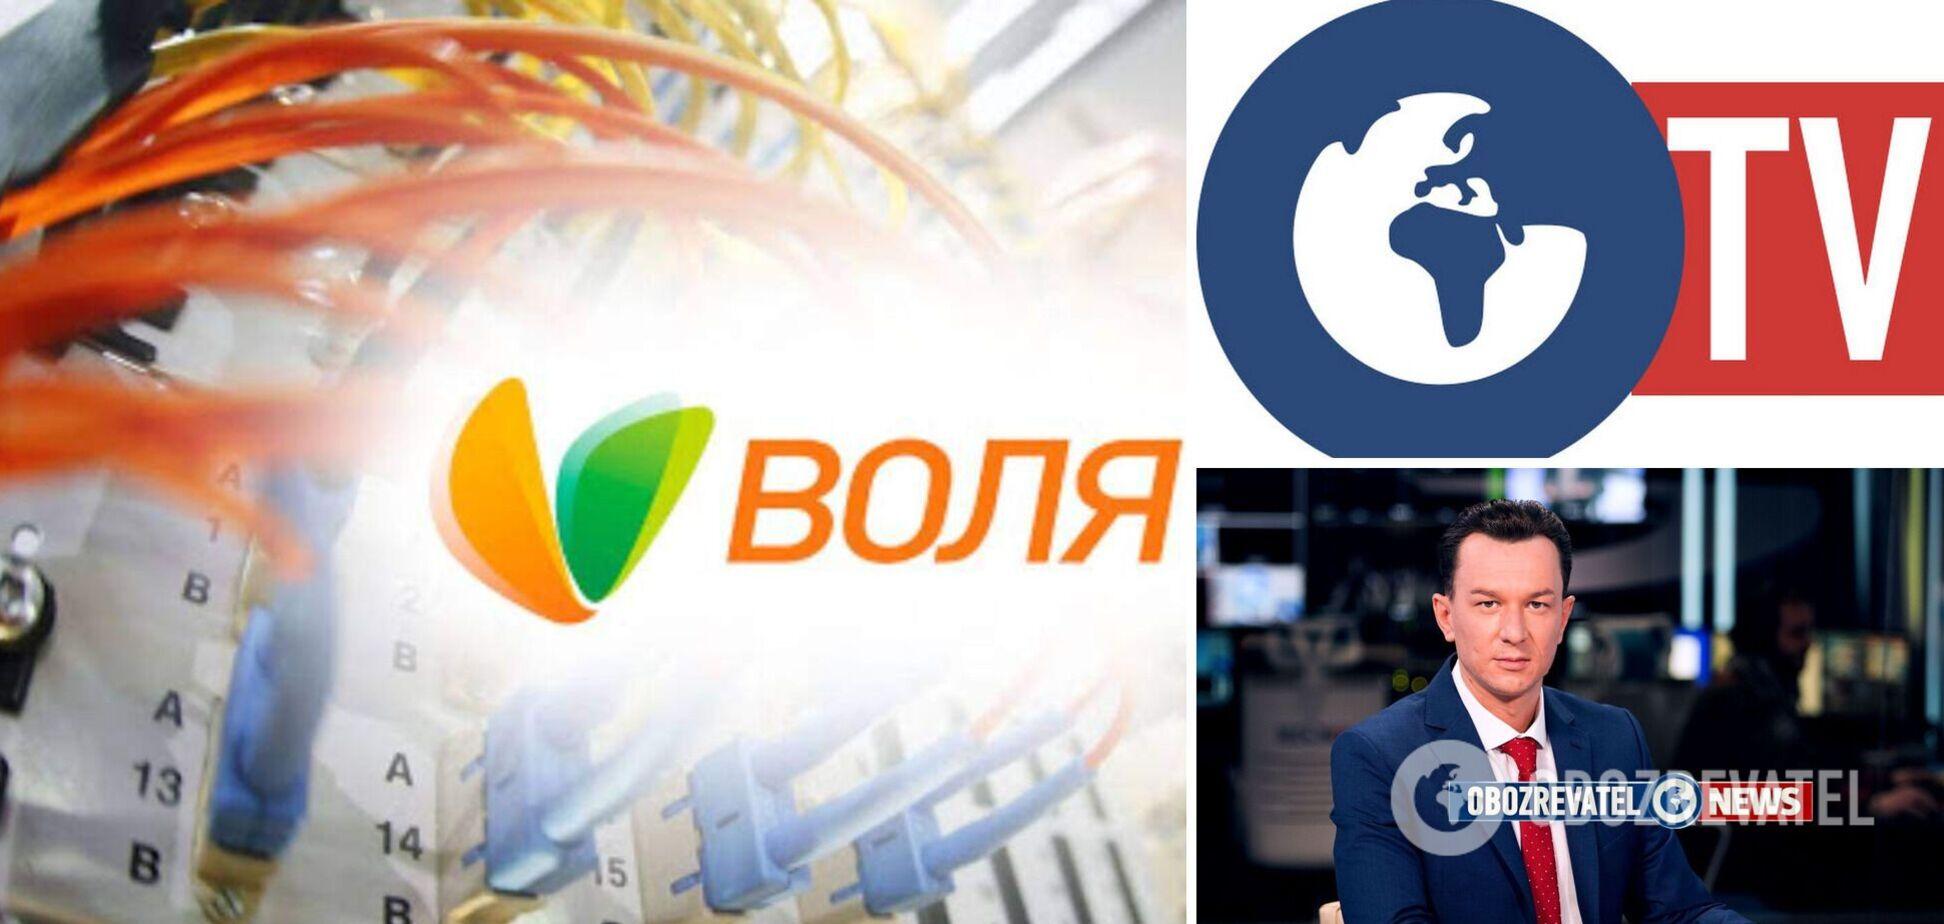 С 1 октября OBOZREVATEL TV будет включен вовсеTV-пакетыпровайдера 'Воля'